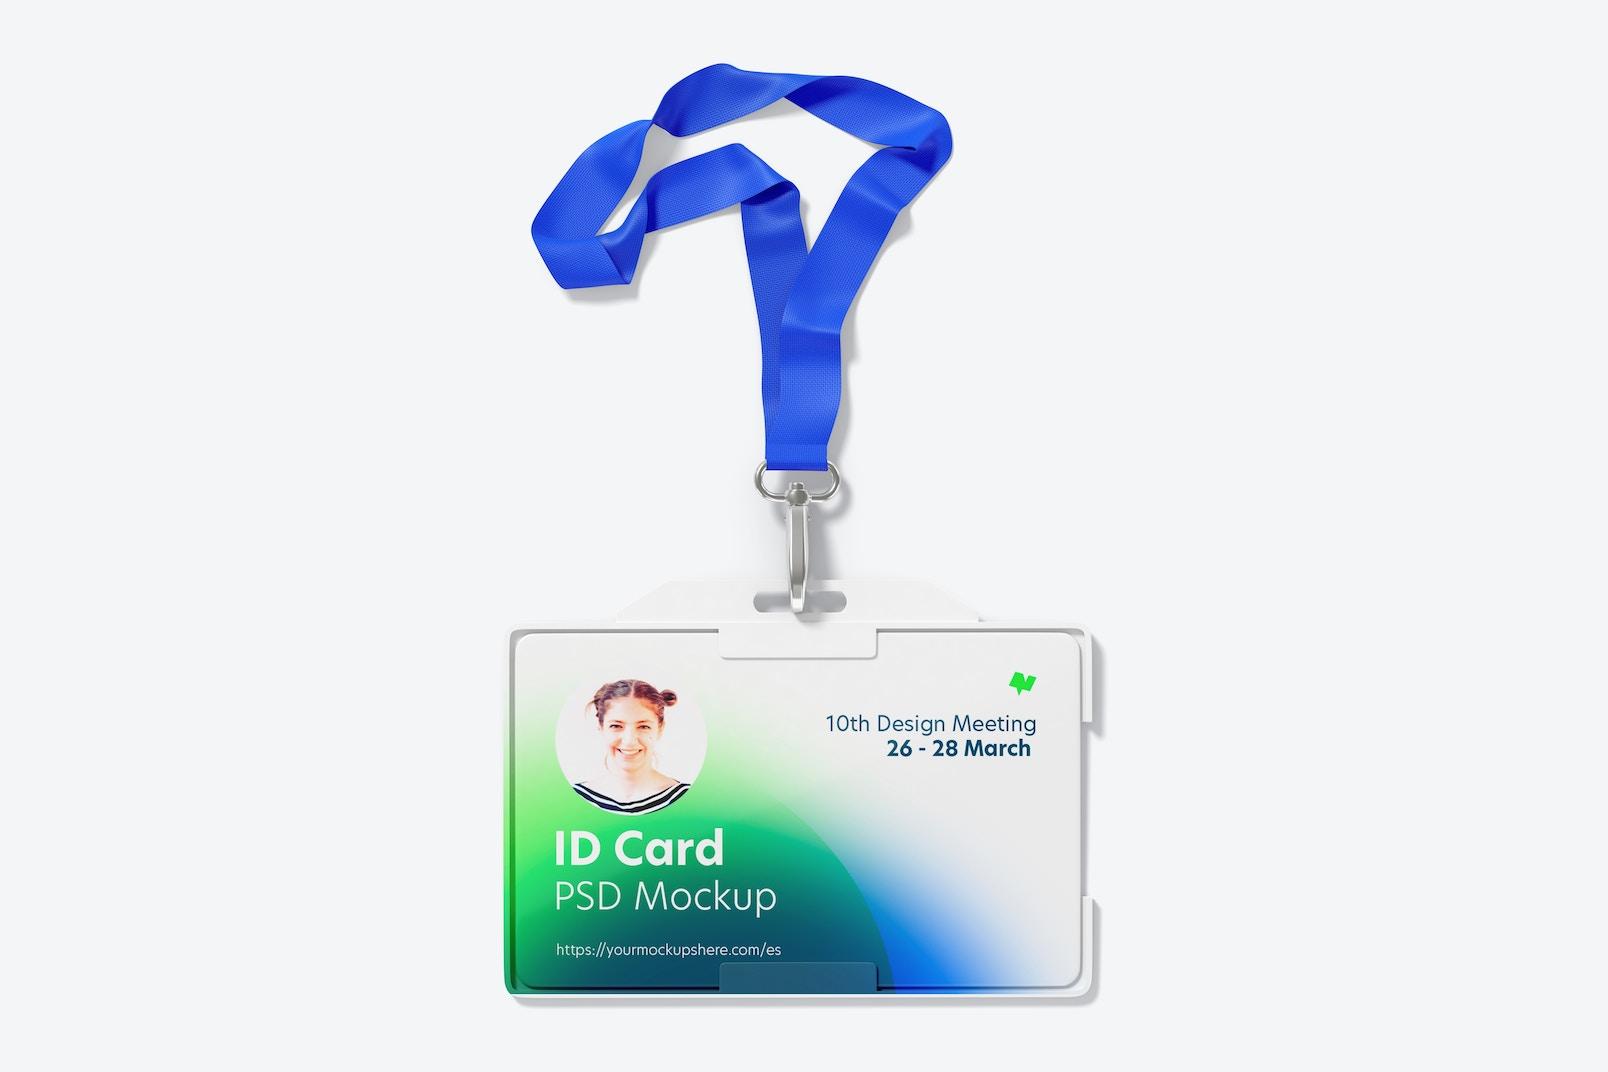 Horizontal ID Card with Lanyard Mockup